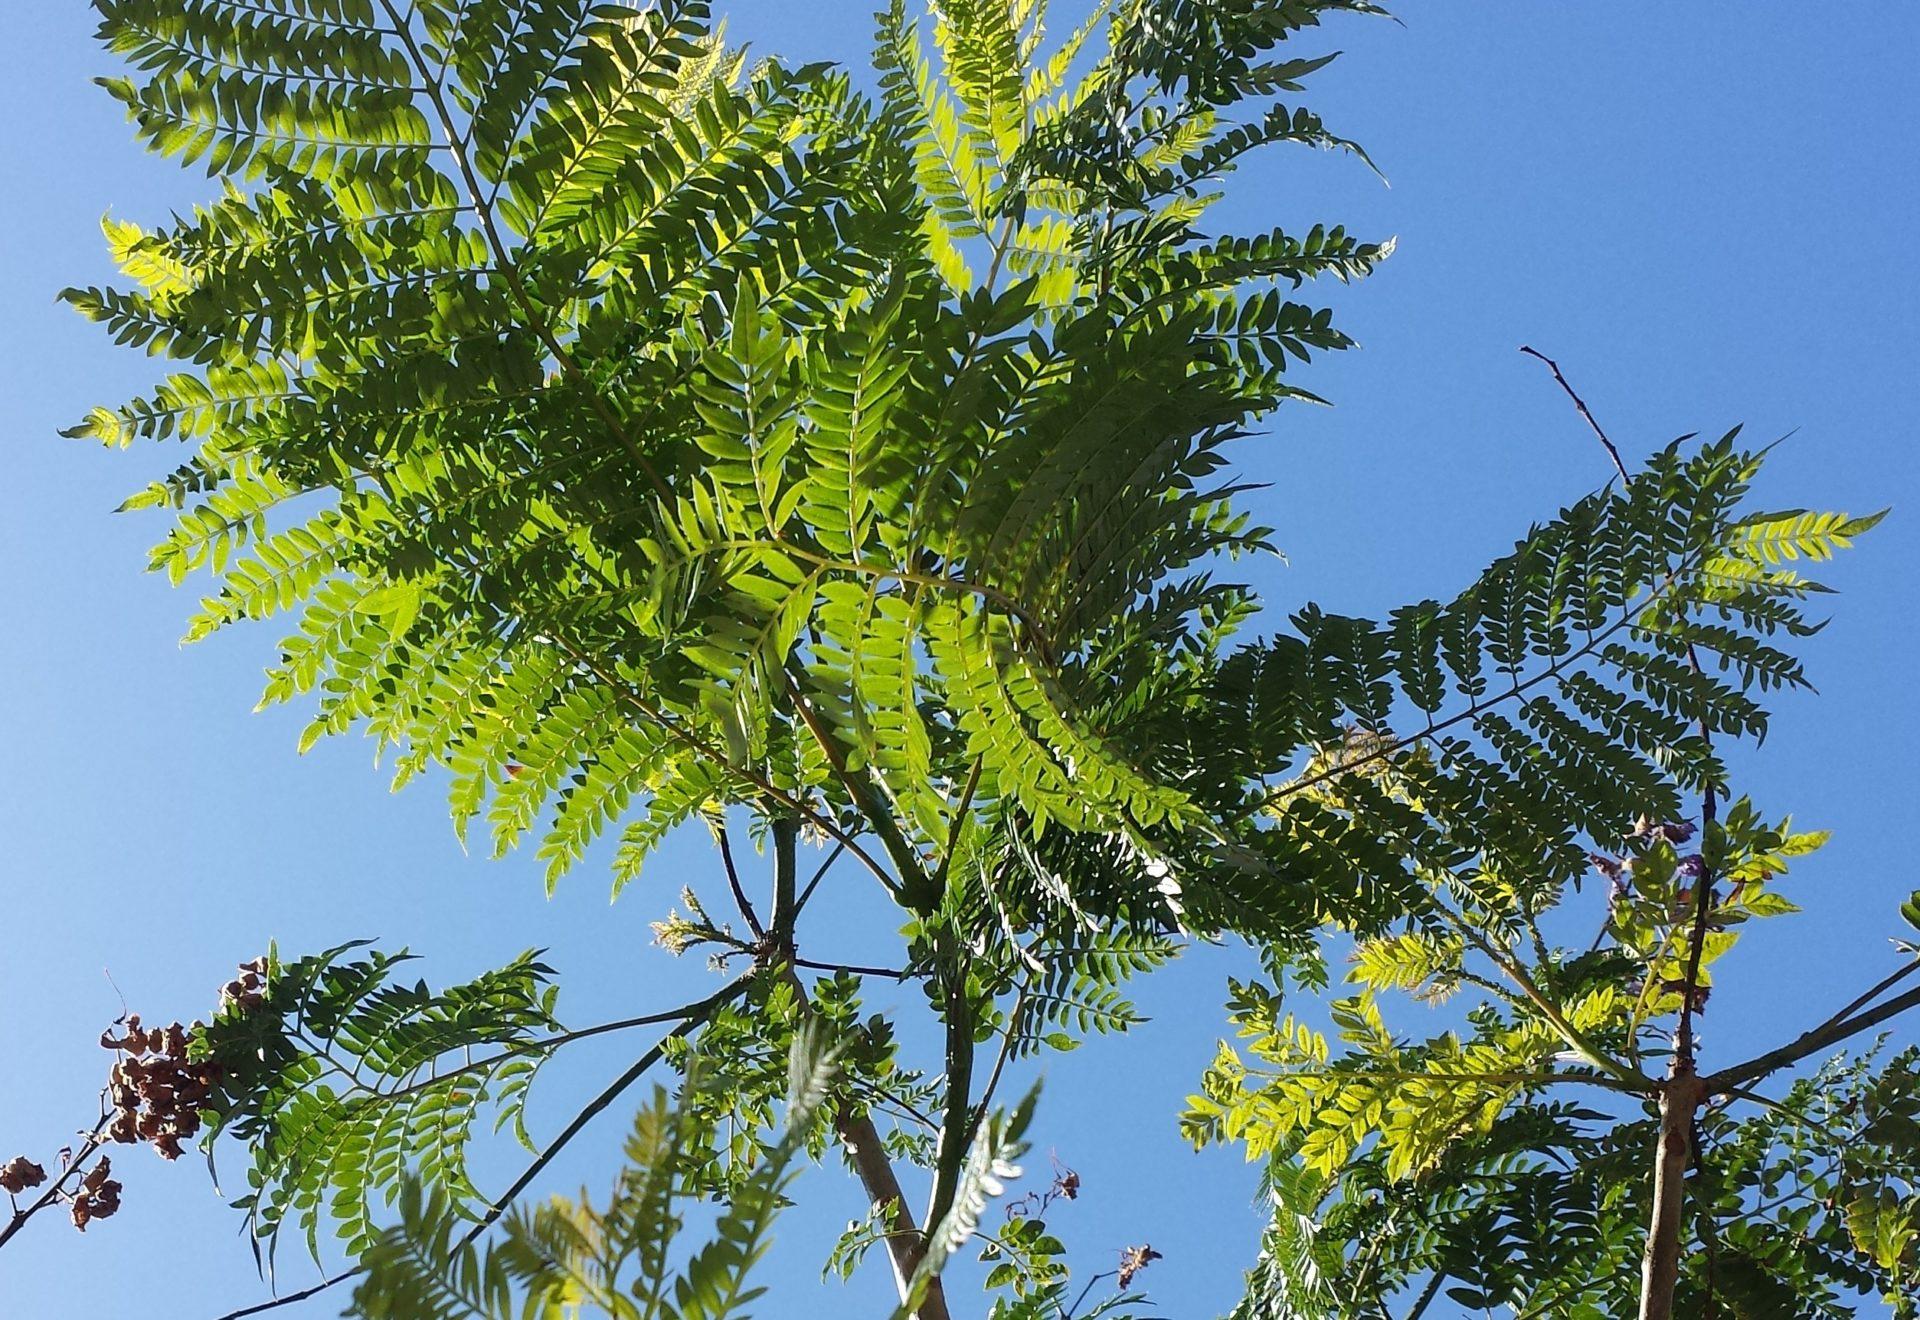 Ferns in the Sky